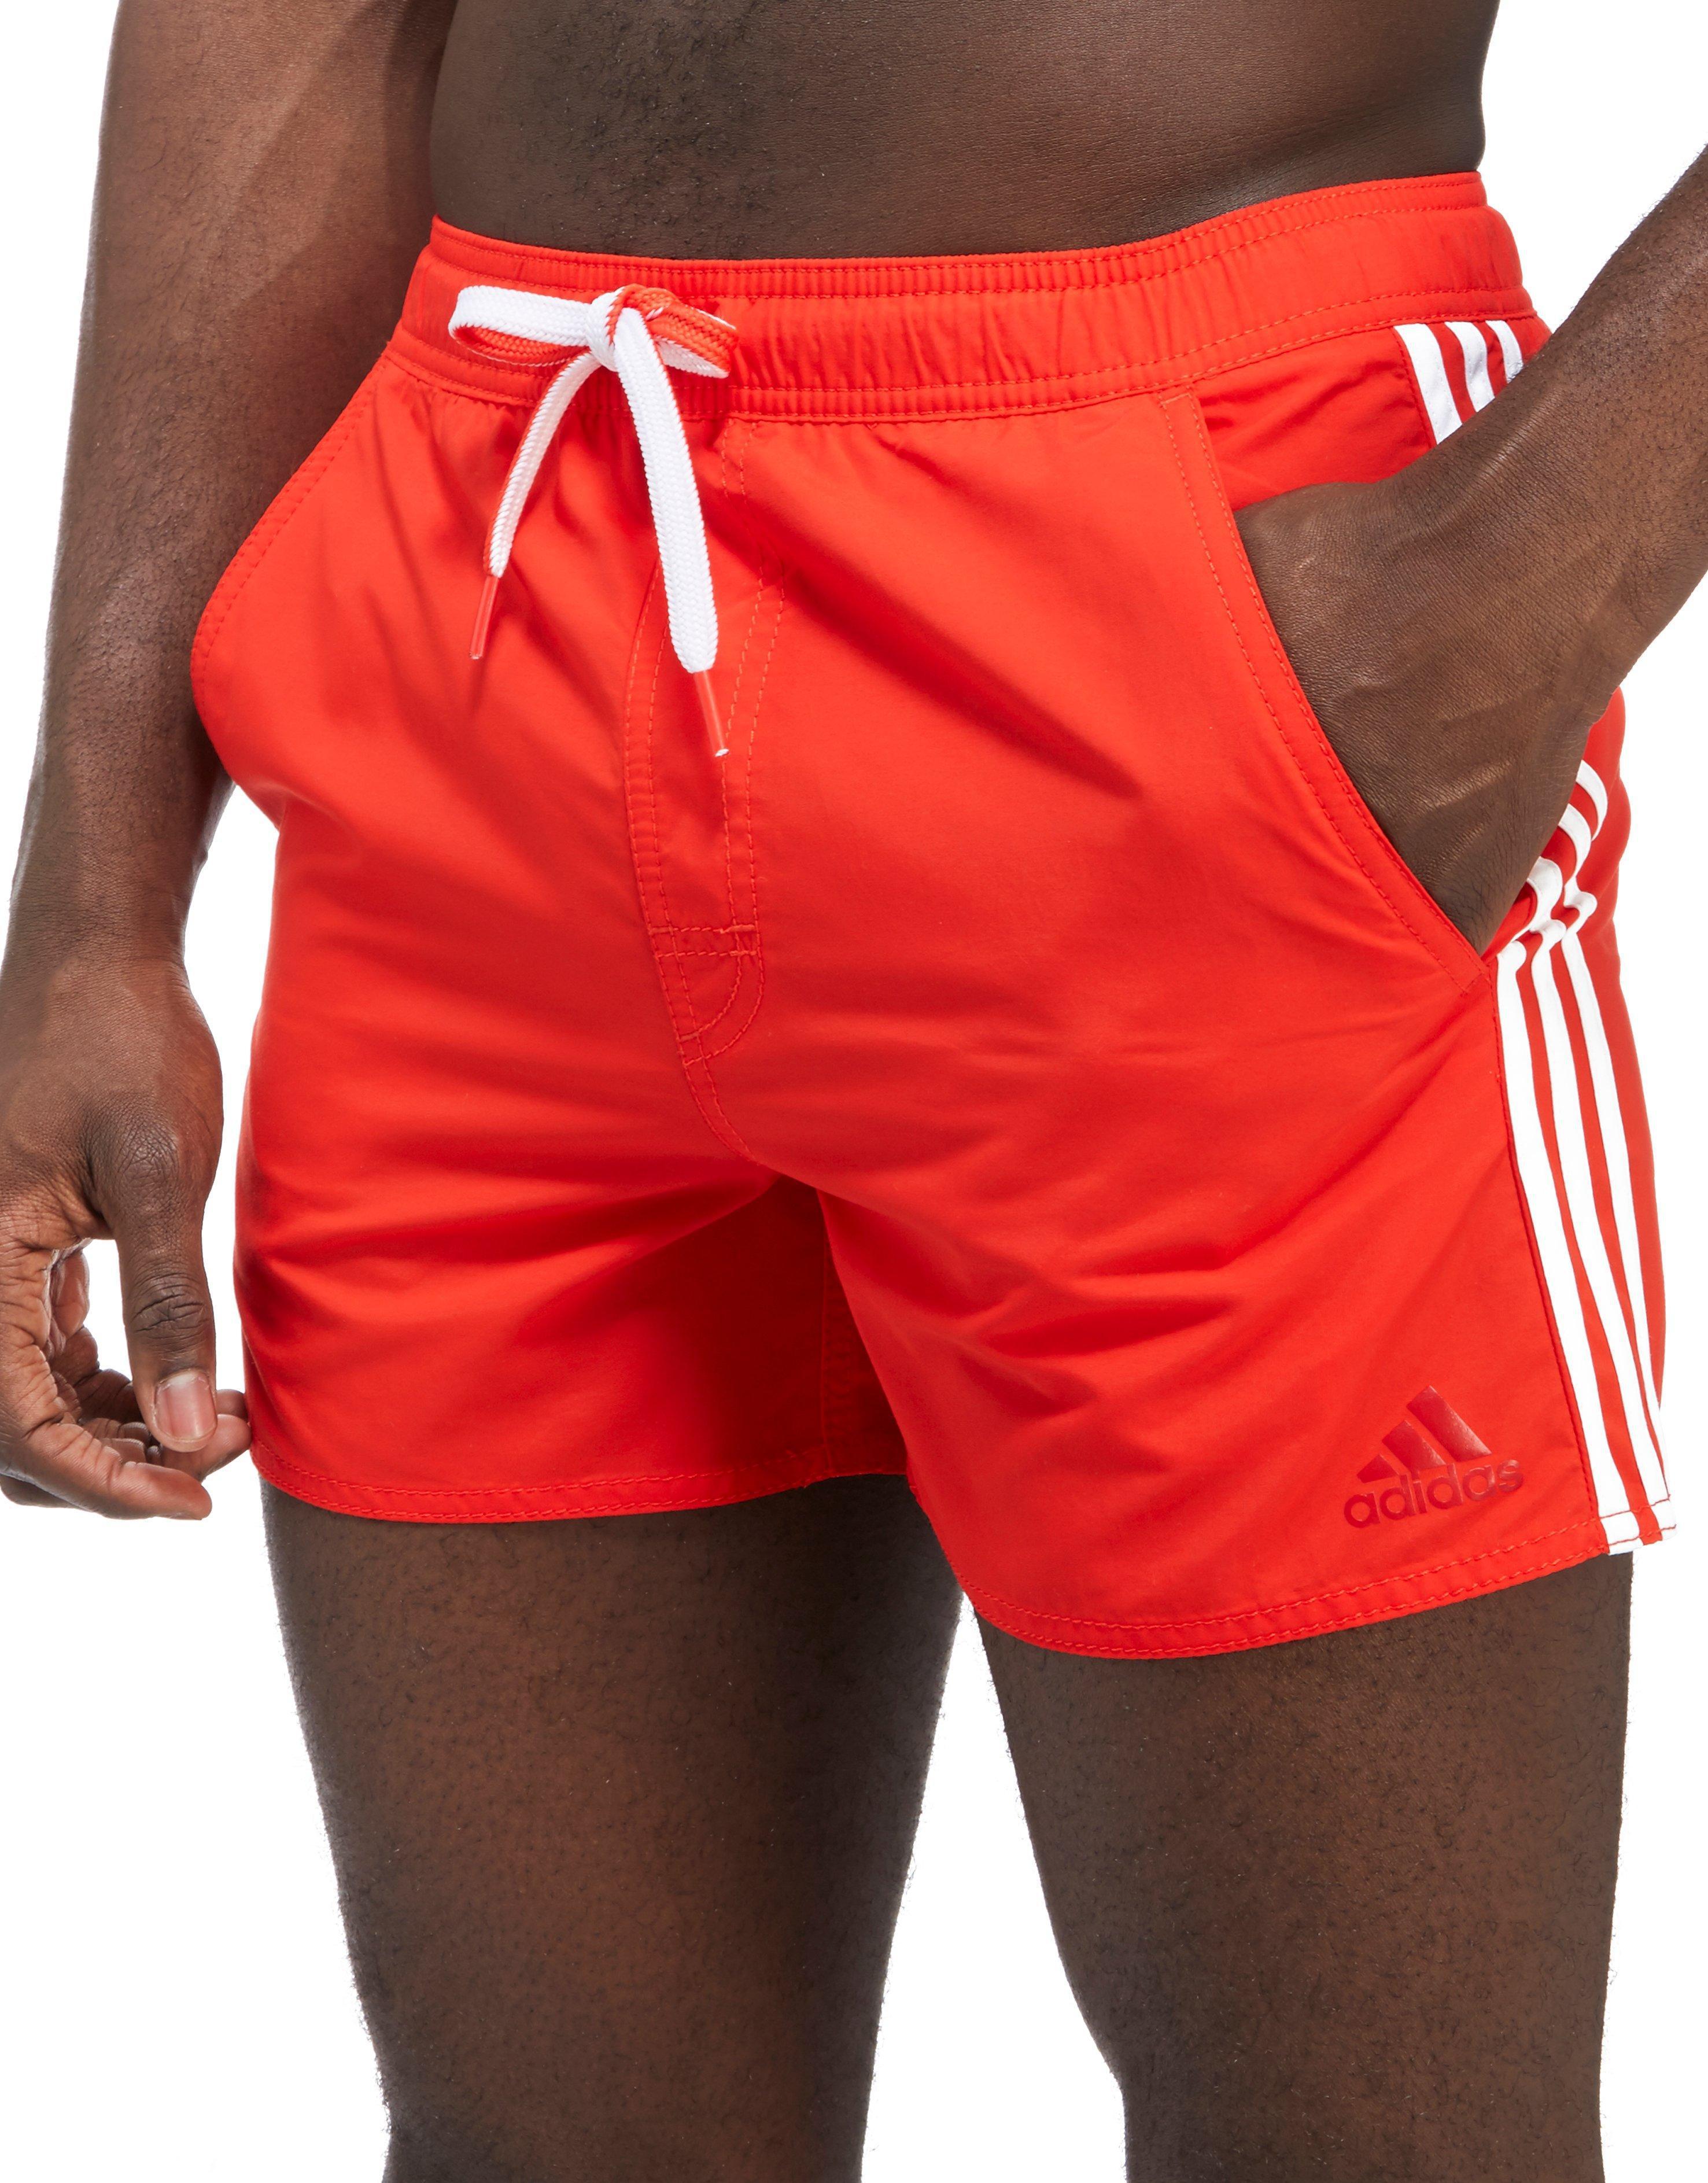 2cdf321690 adidas 3-stripes Swim Shorts in Red for Men - Lyst